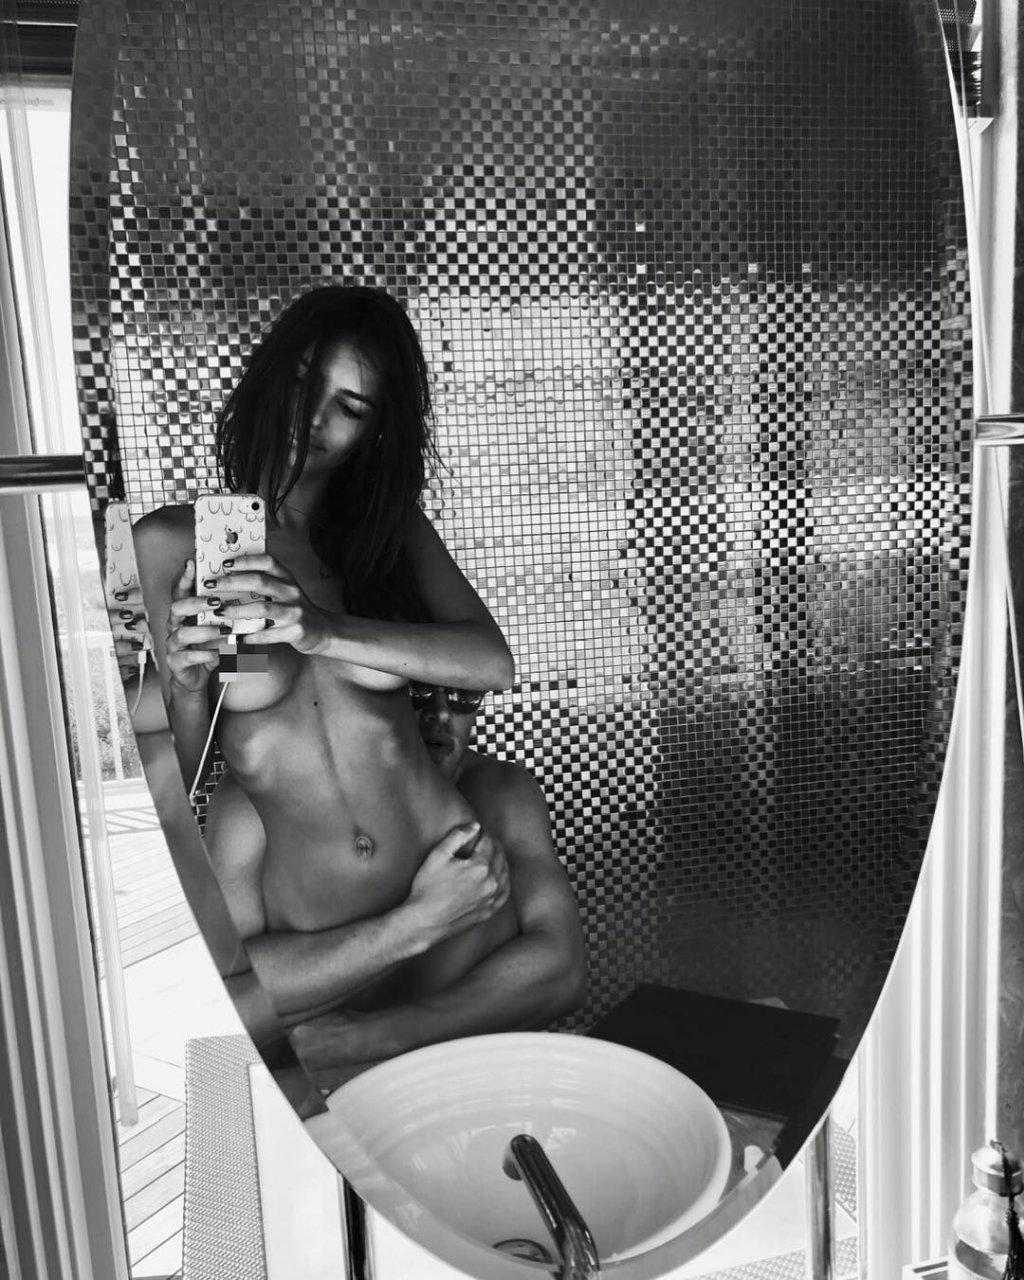 La instagram models